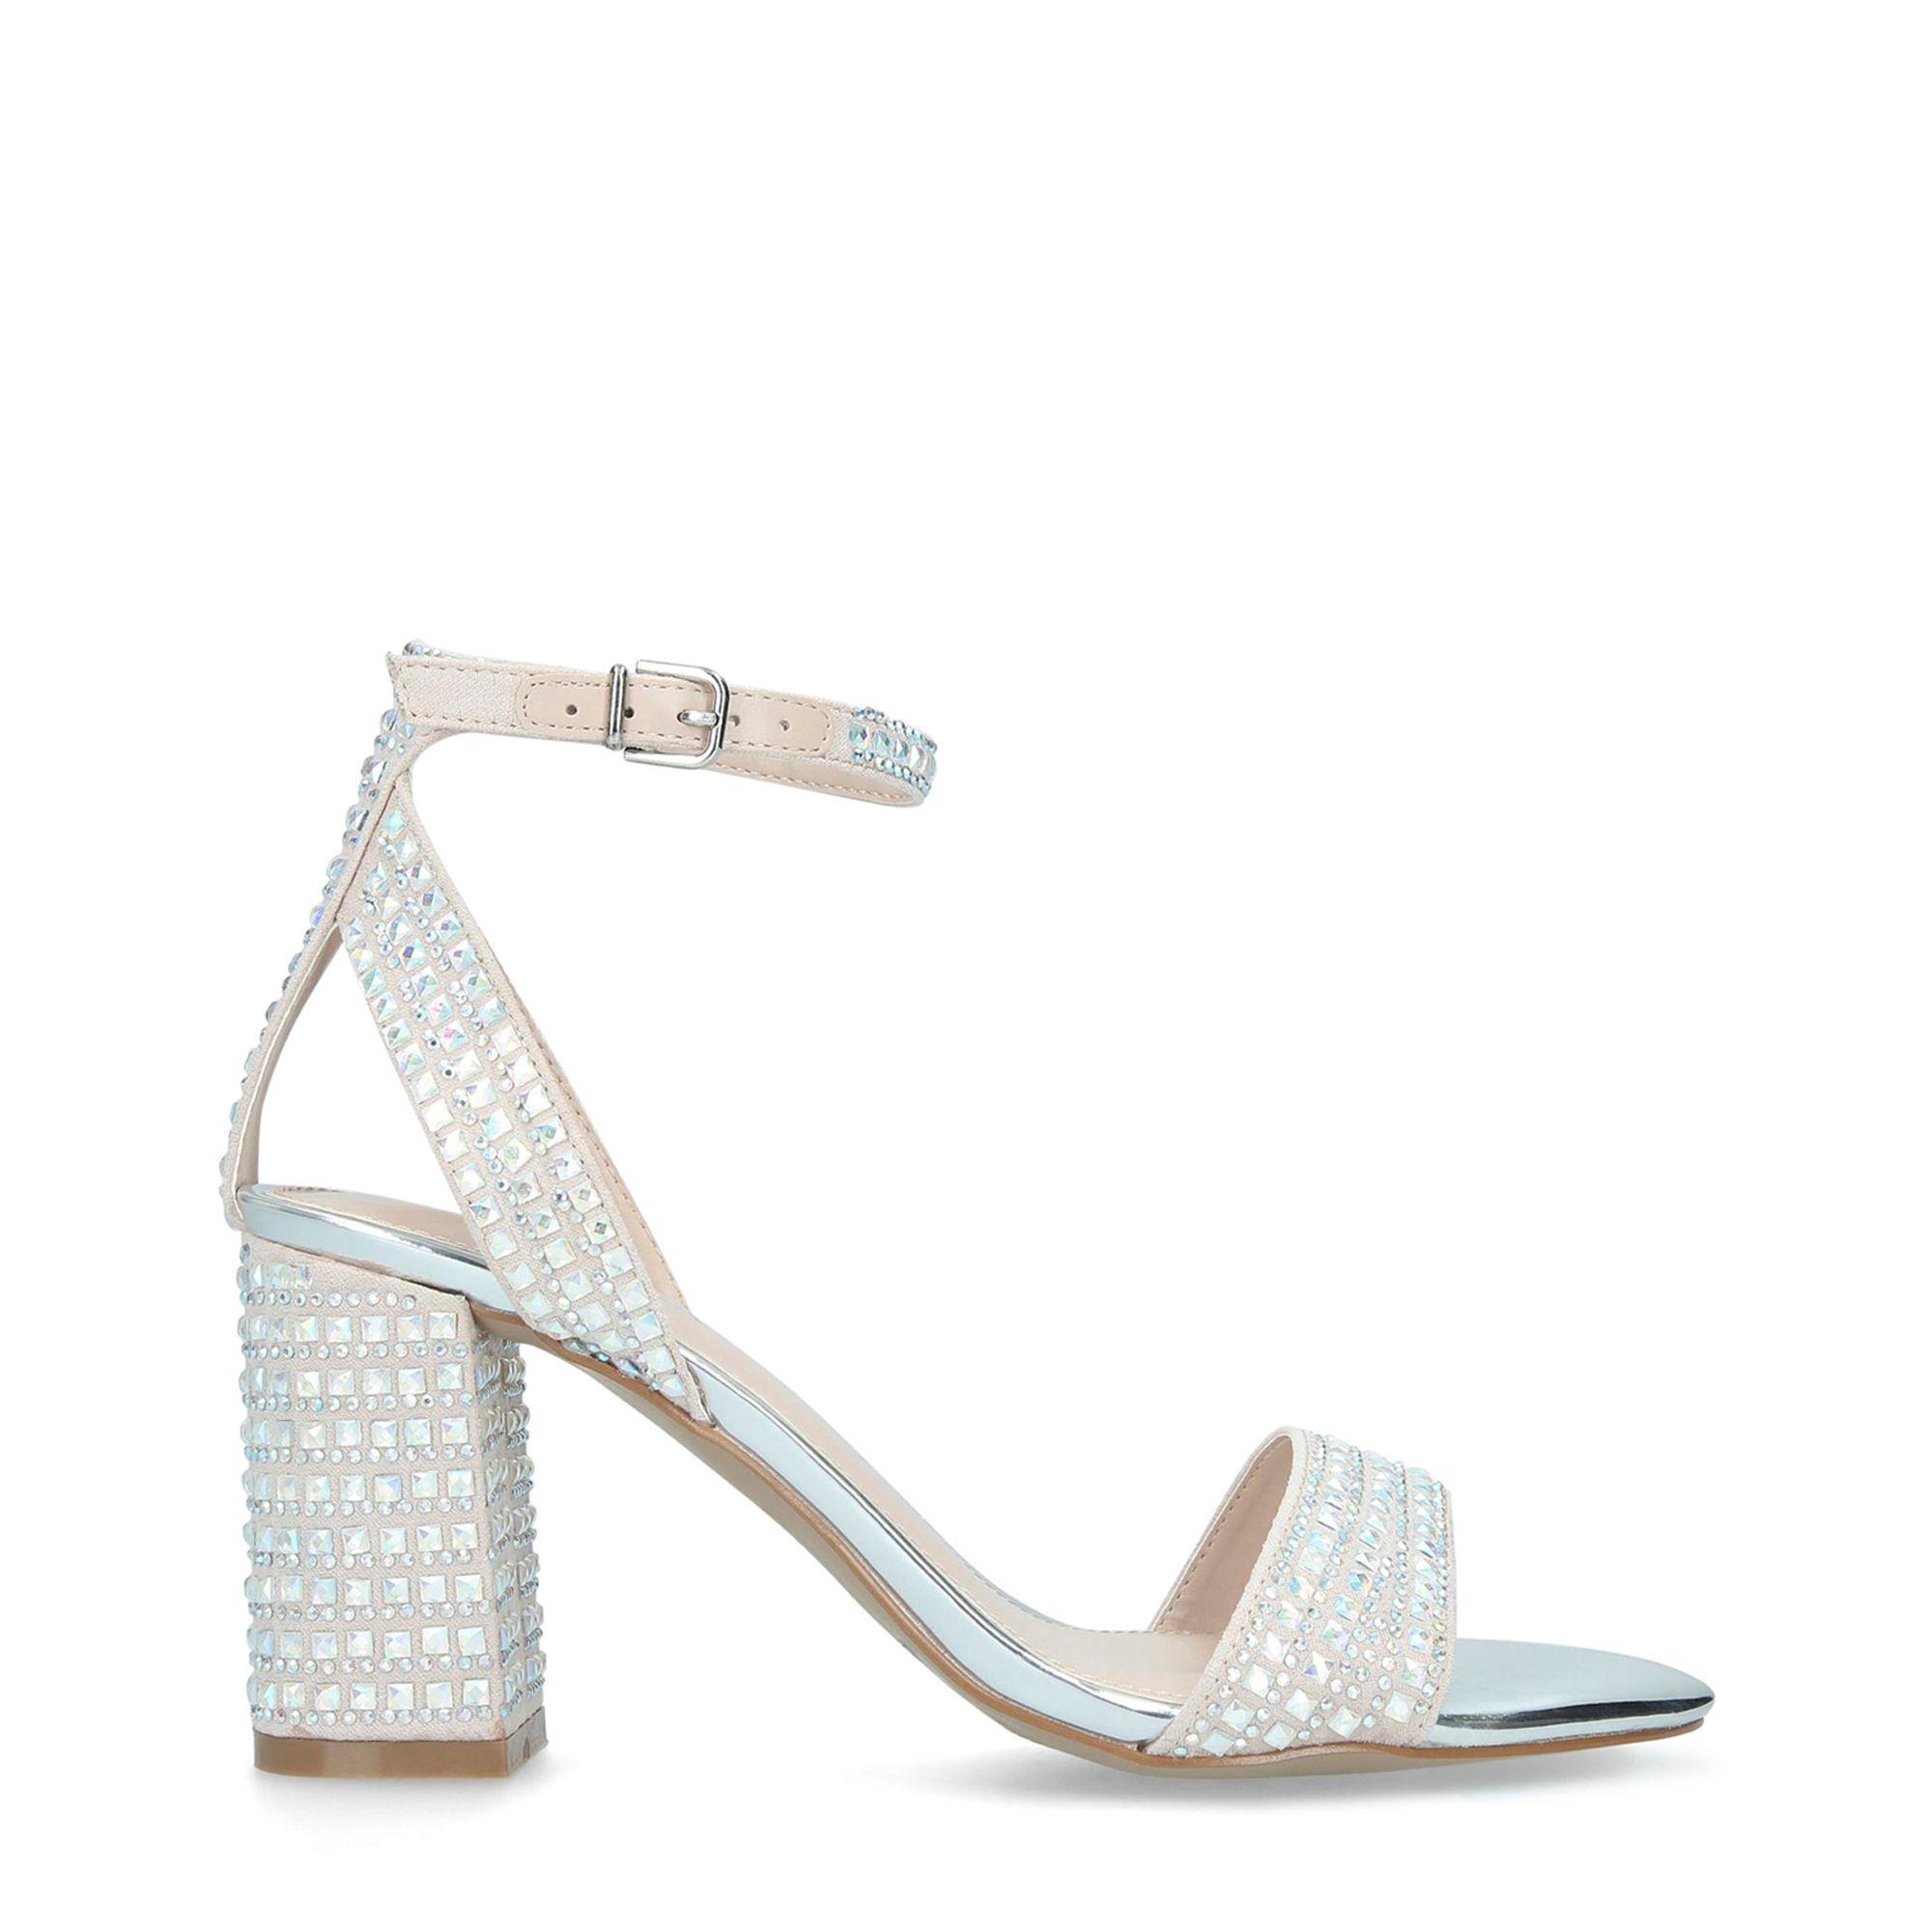 9542b765189 Carvela Kurt Geiger Nude  kianni  High Heel Sandals in Natural - Lyst